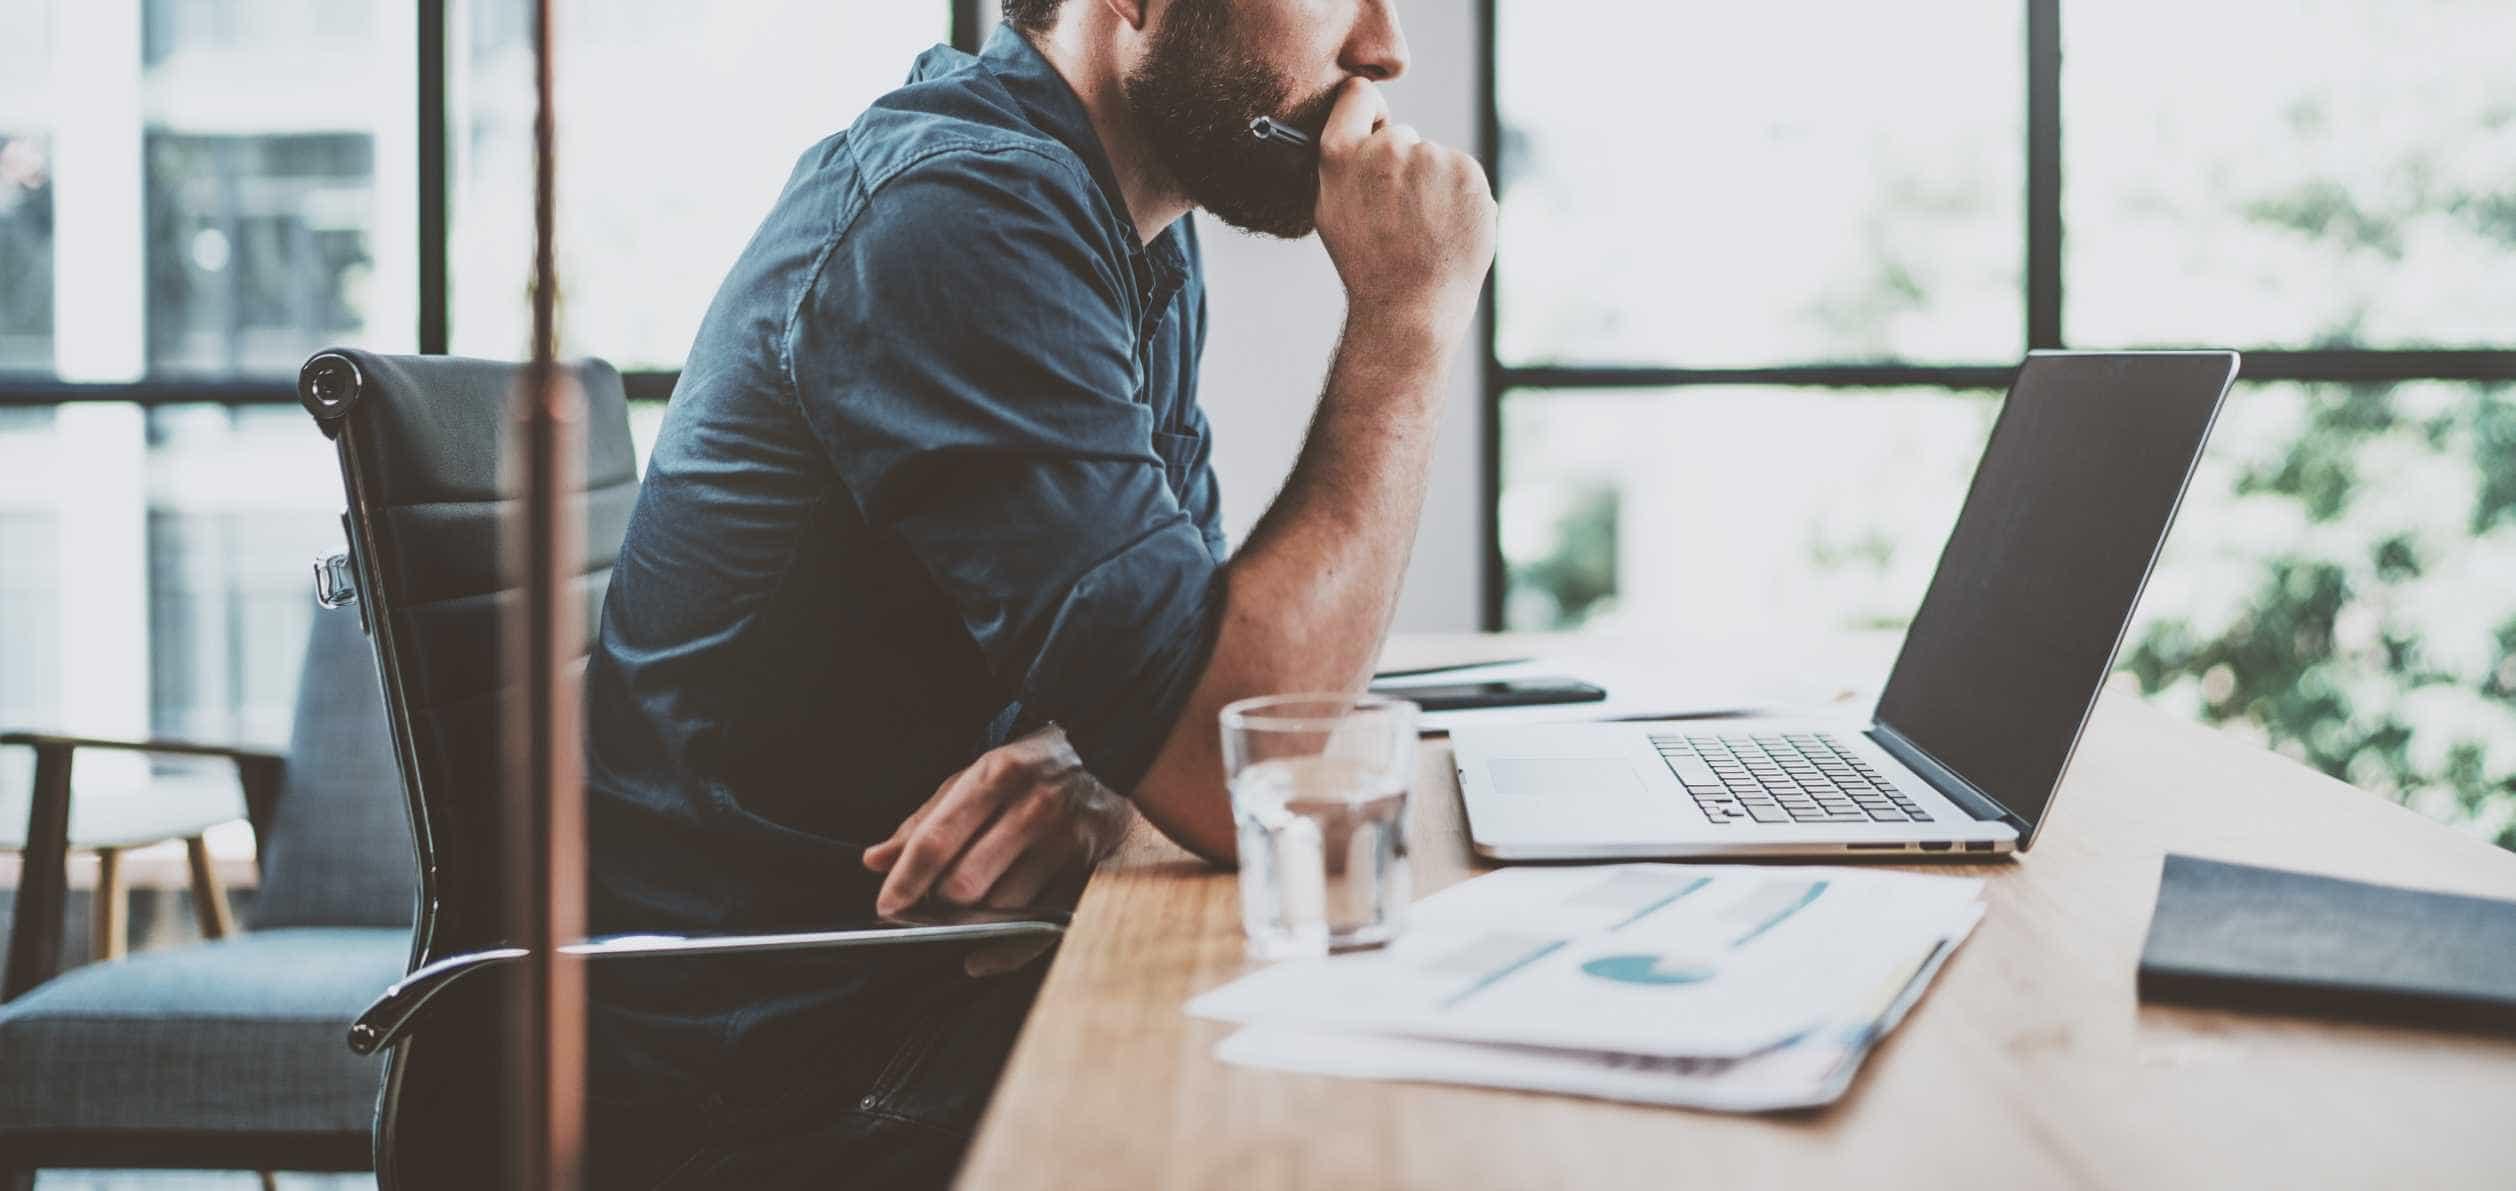 Investir na própria startup ou equilibrar contas? Empreendedores opinam